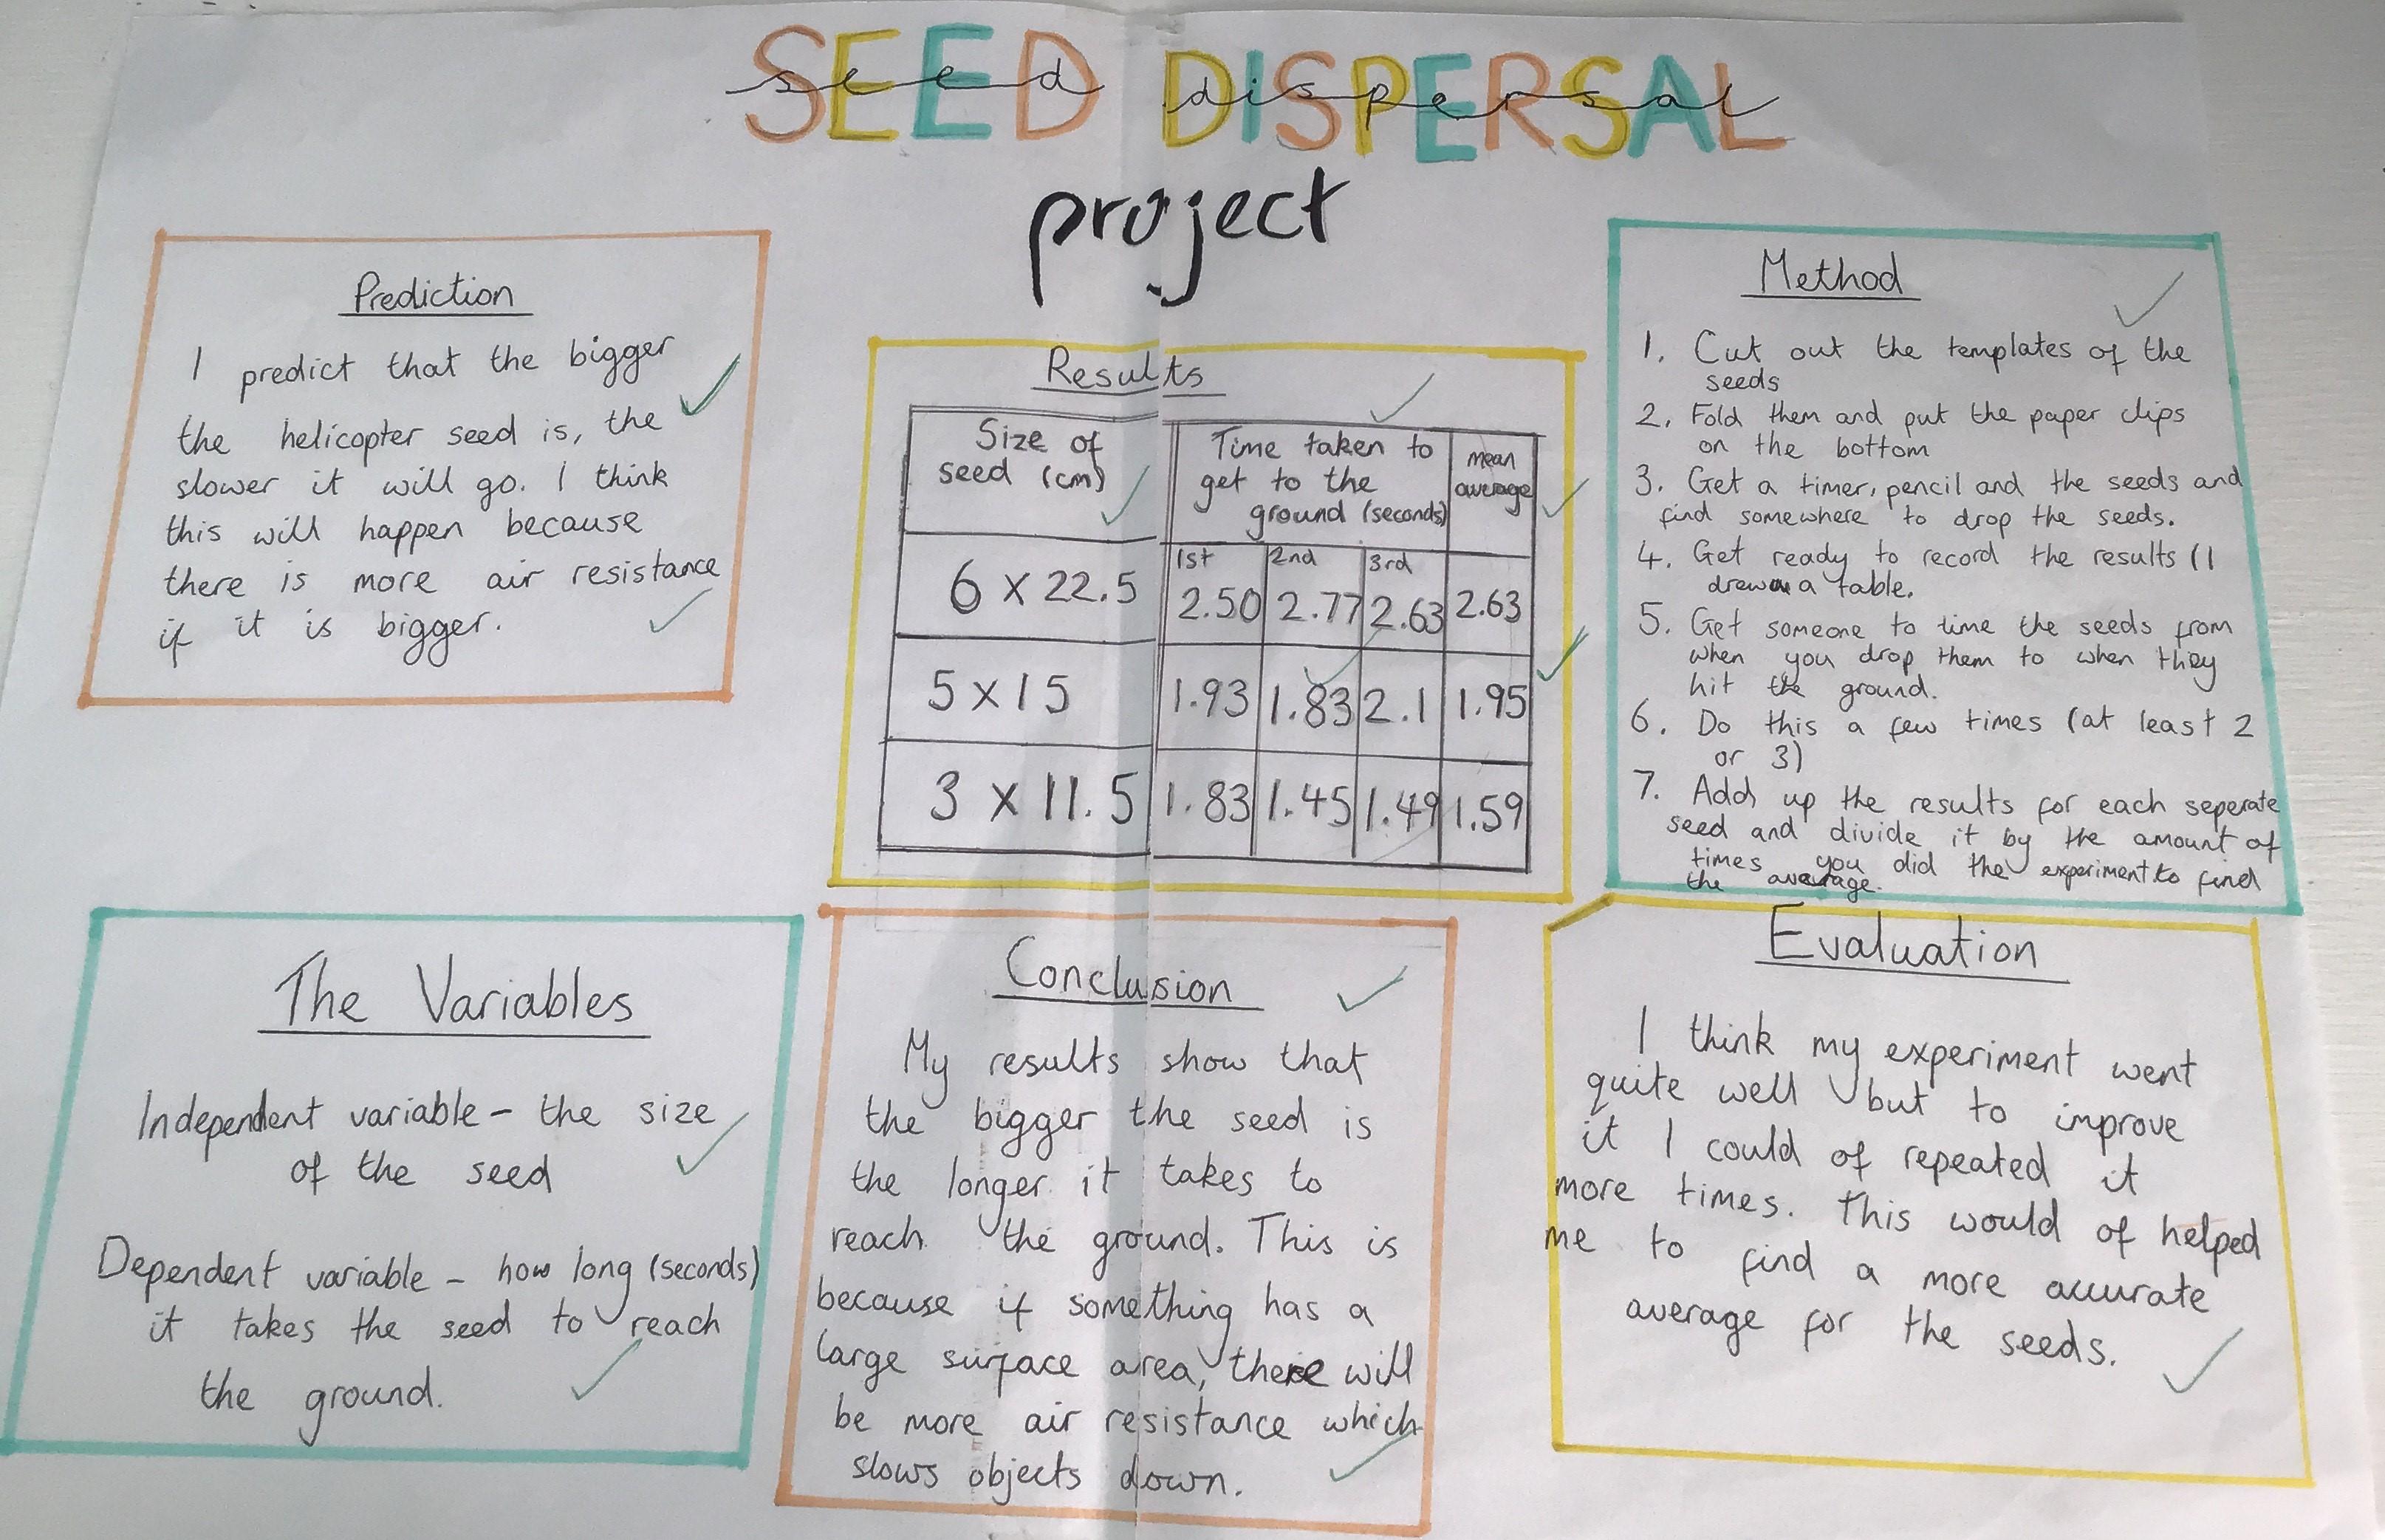 1_Seed-Dispersal